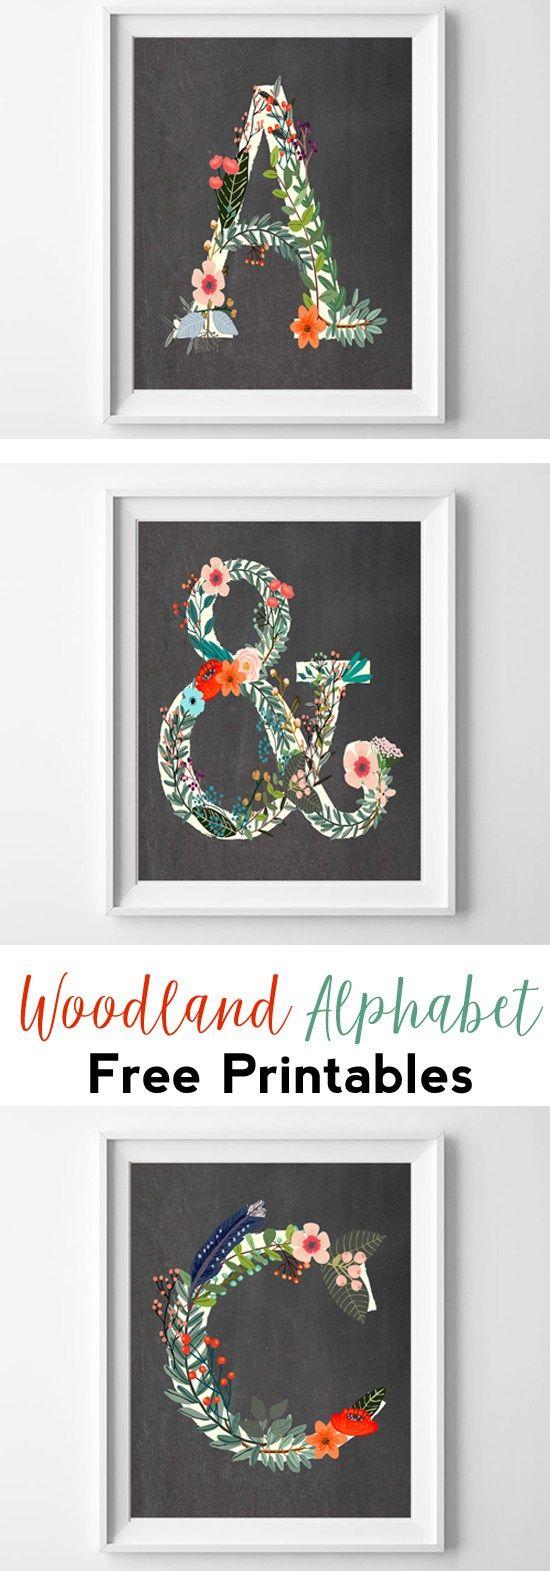 woodland alphabet free printable wall art | nursery printables